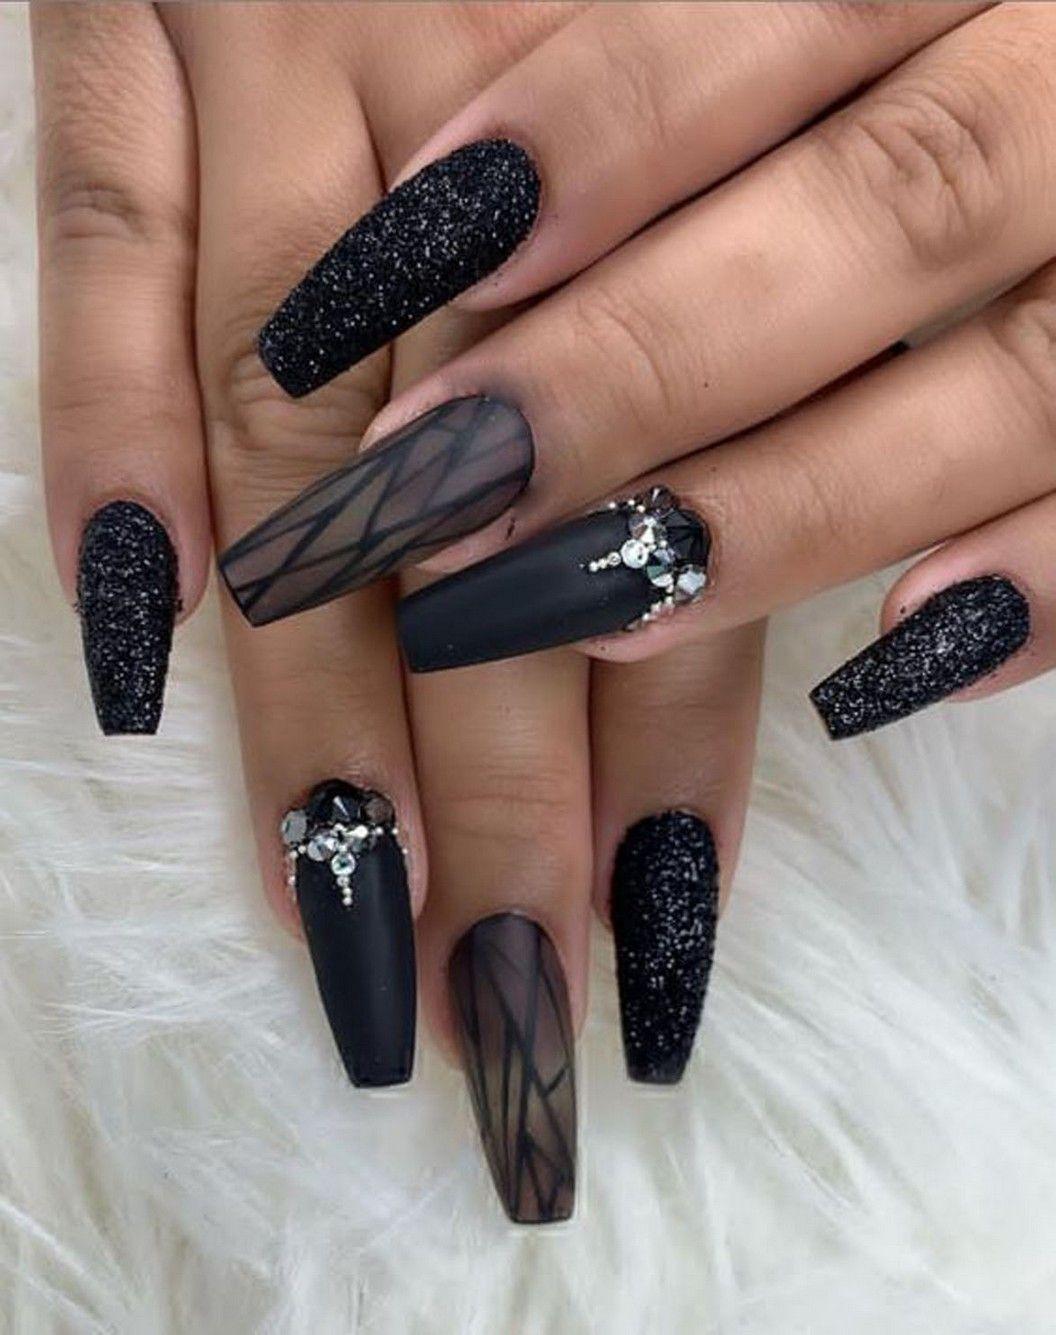 22 Best Matte Black Coffin Nail Ideas 19 In 2020 Nails Design With Rhinestones Black Nail Designs Coffin Nails Designs